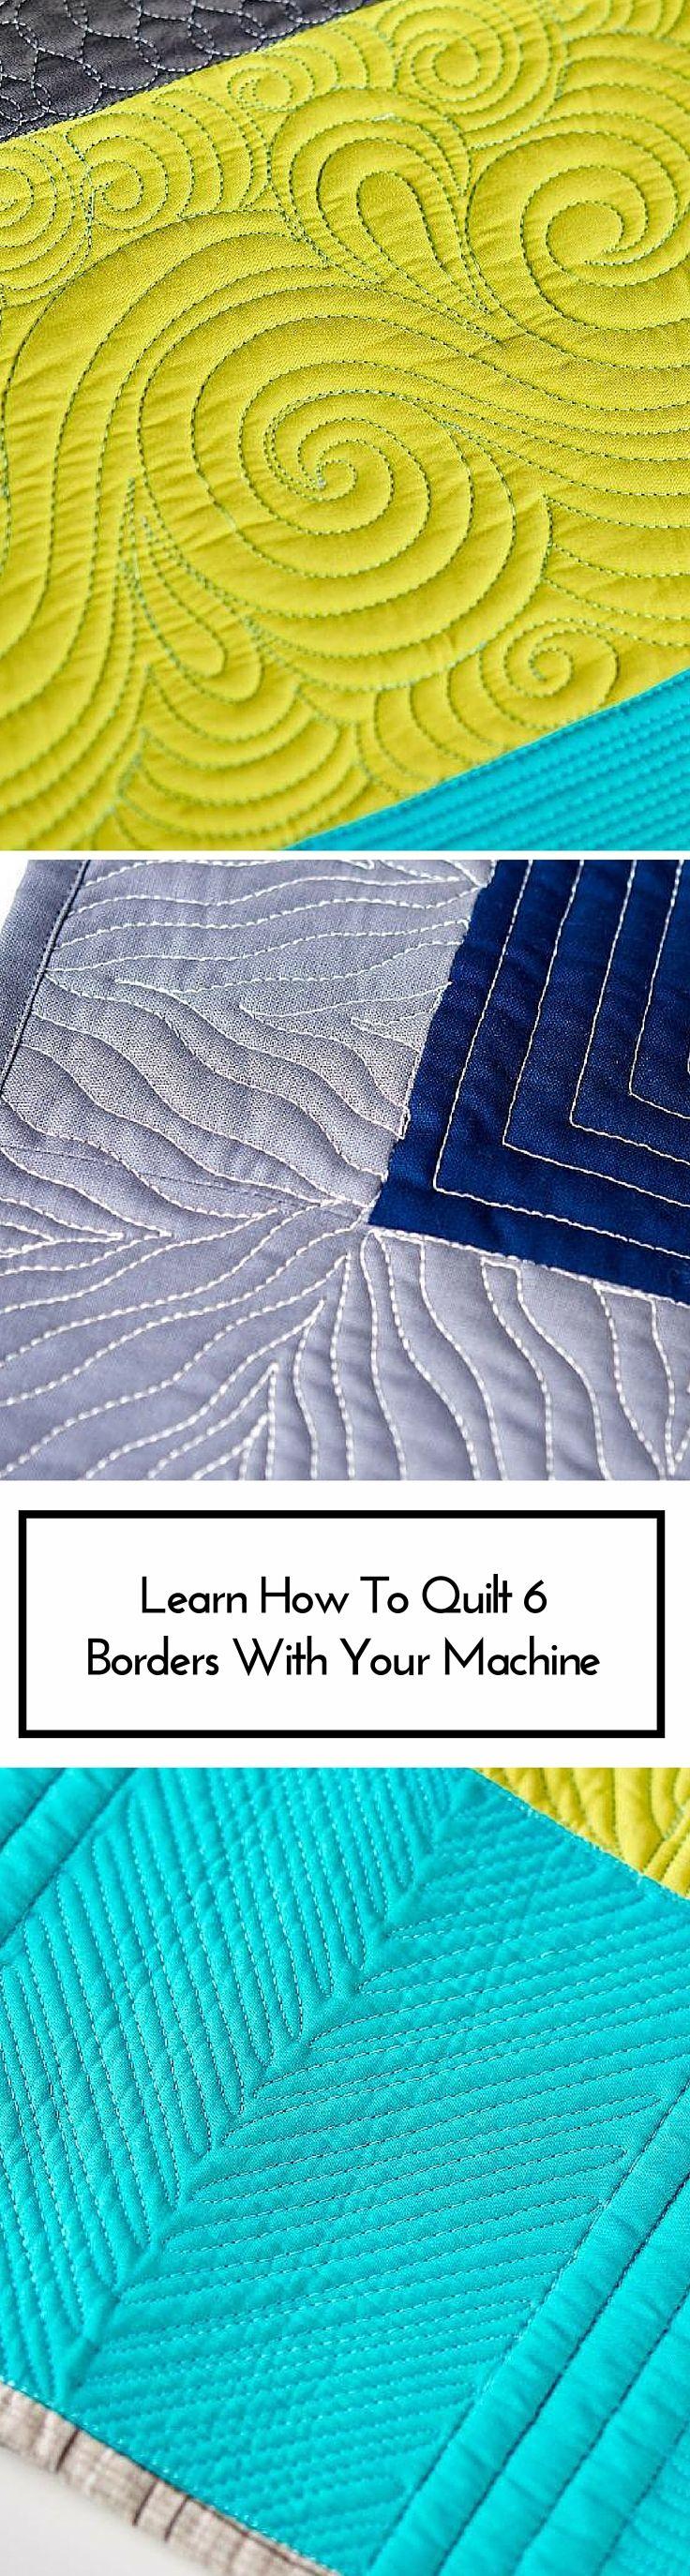 163 best quilt borders images on pinterest bedspreads quilt